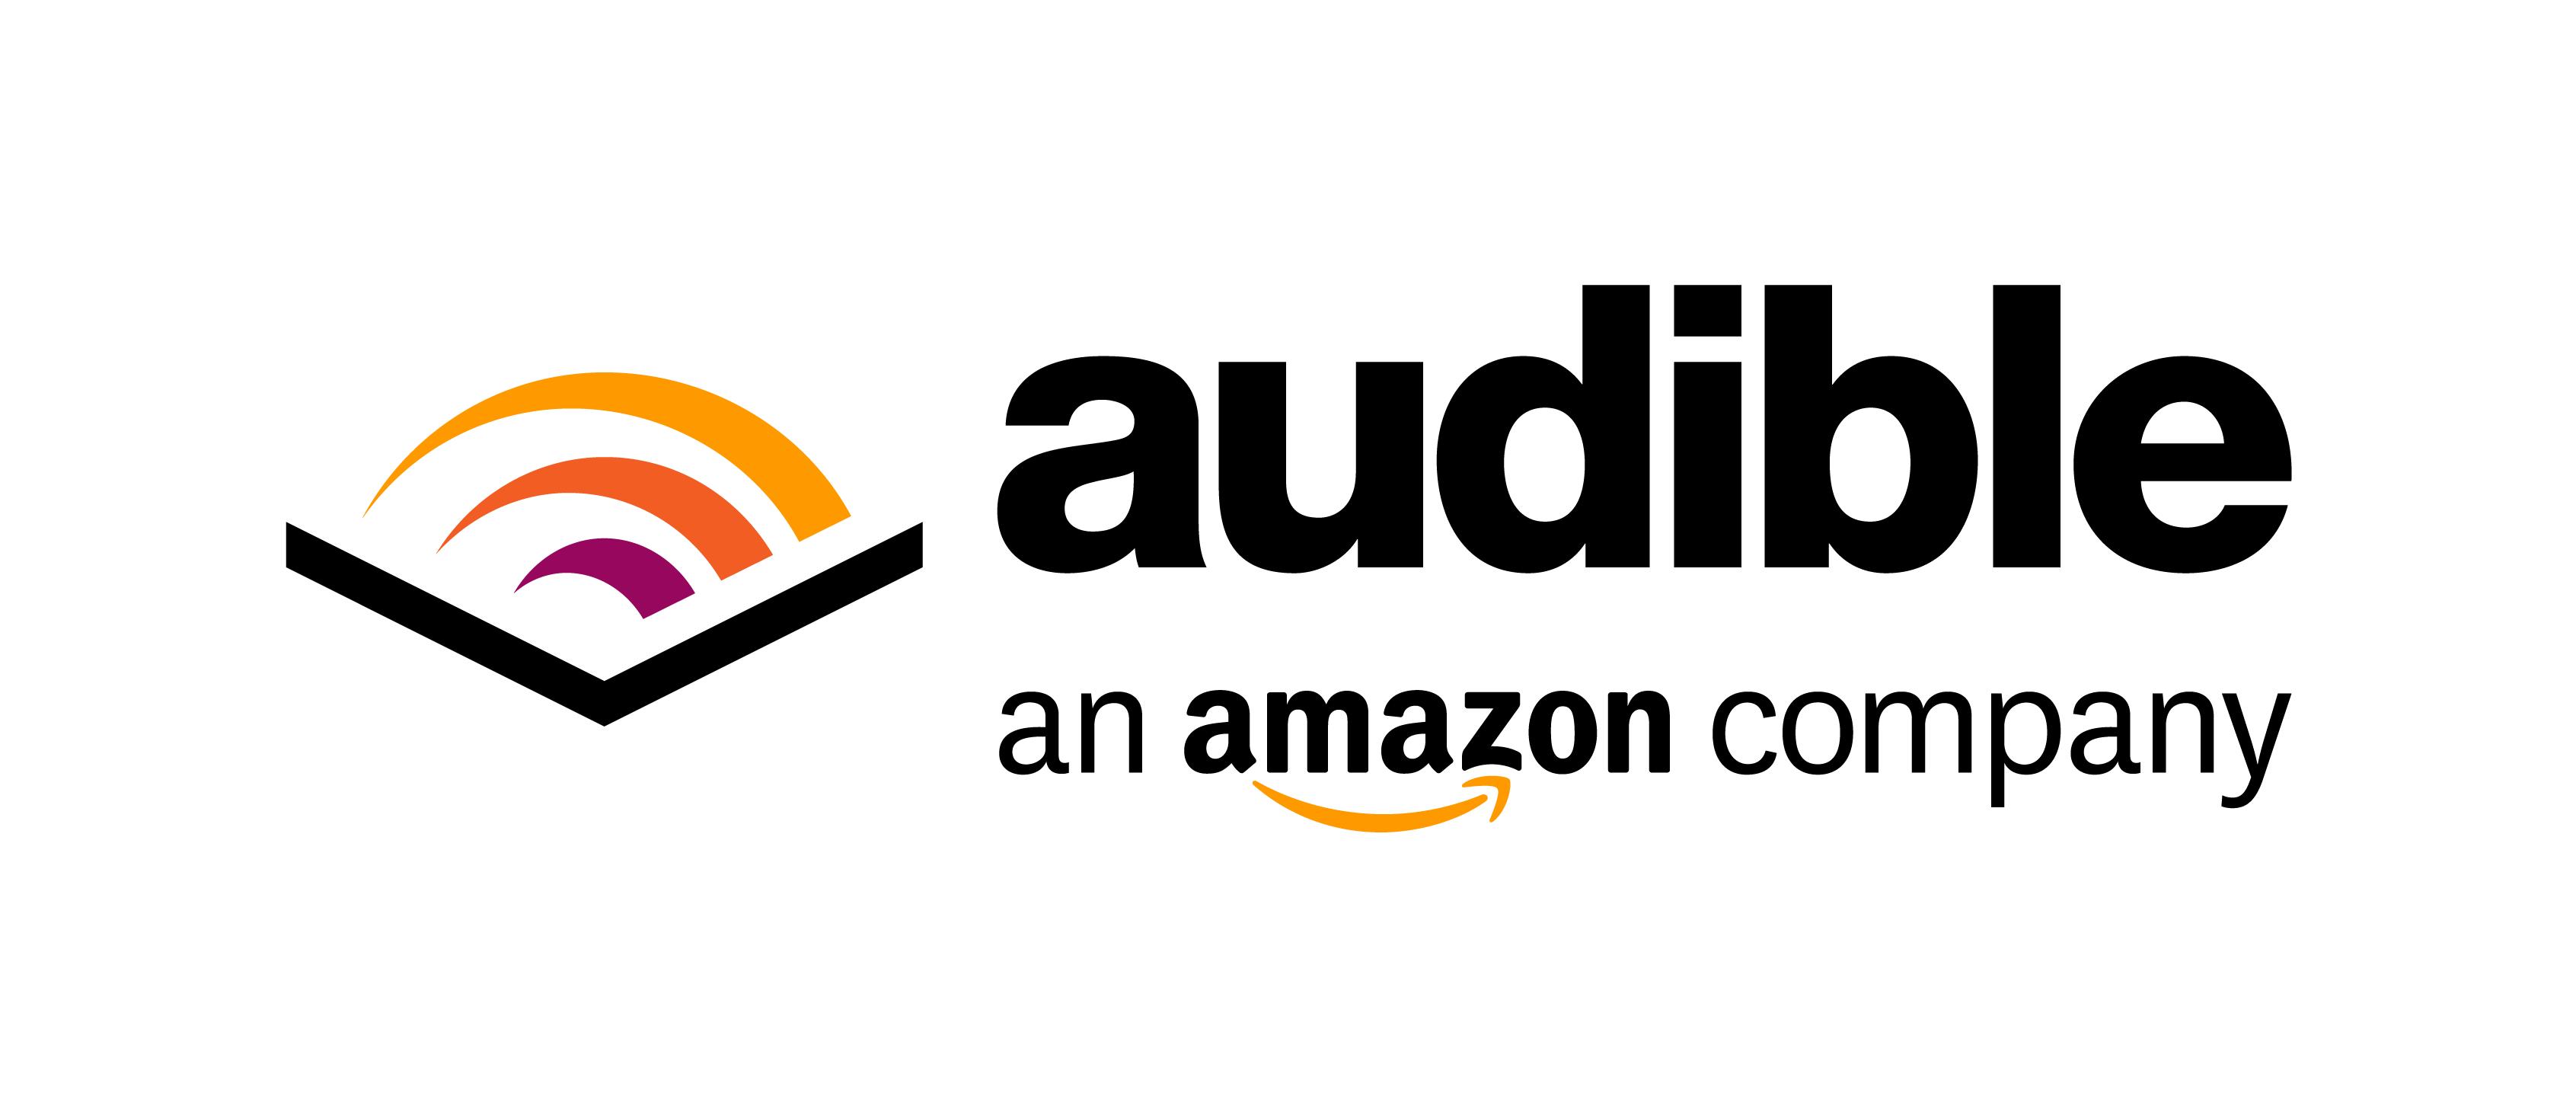 Amazon's latest Kindle update makes Audible integration even better